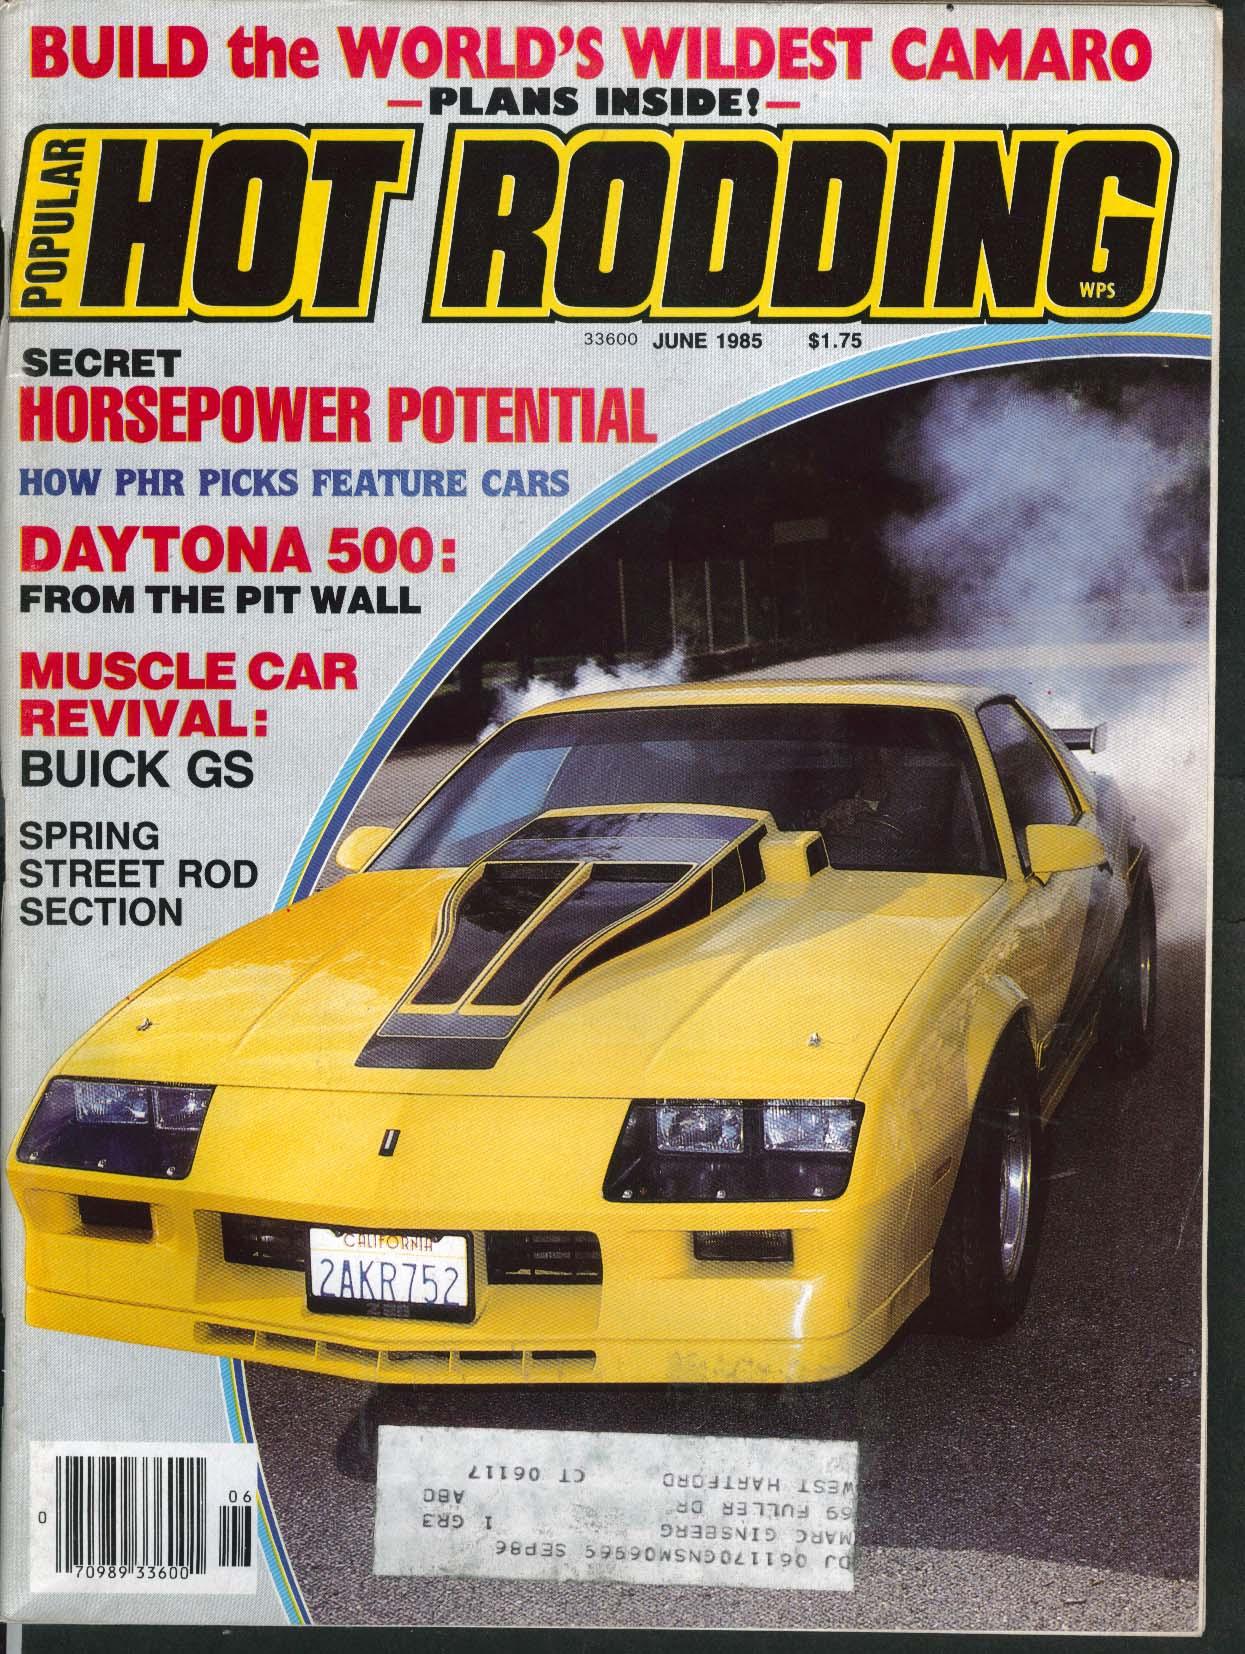 POPULAR HOT RODDING Daytona 500 Buick GS Ed Pender 1923 Ford street rod 6 1985